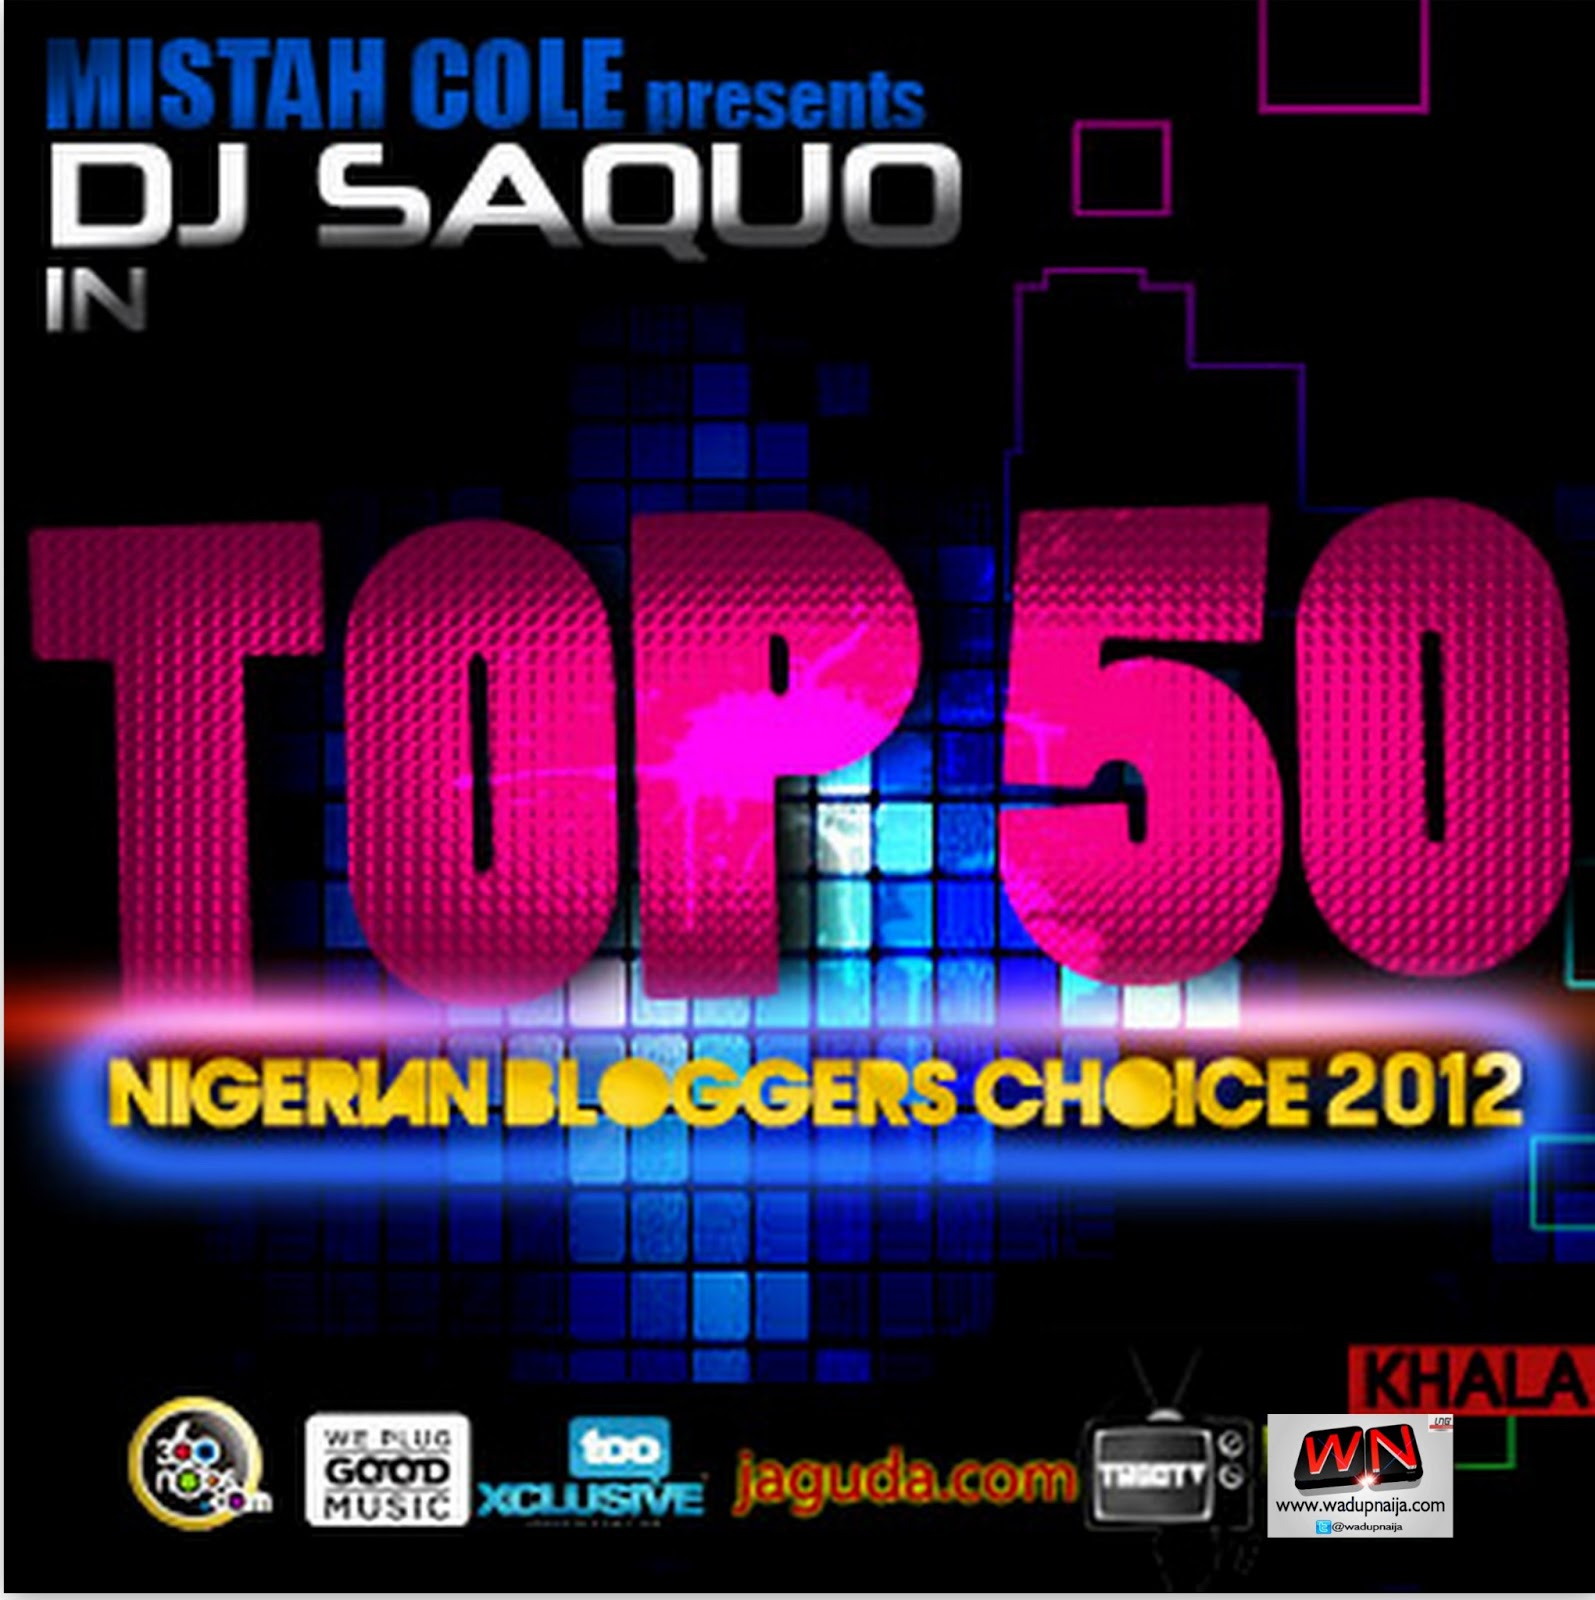 Kilode9ja: [Mixtape]: Top 50 Nigerian Blogger's Choice 2012